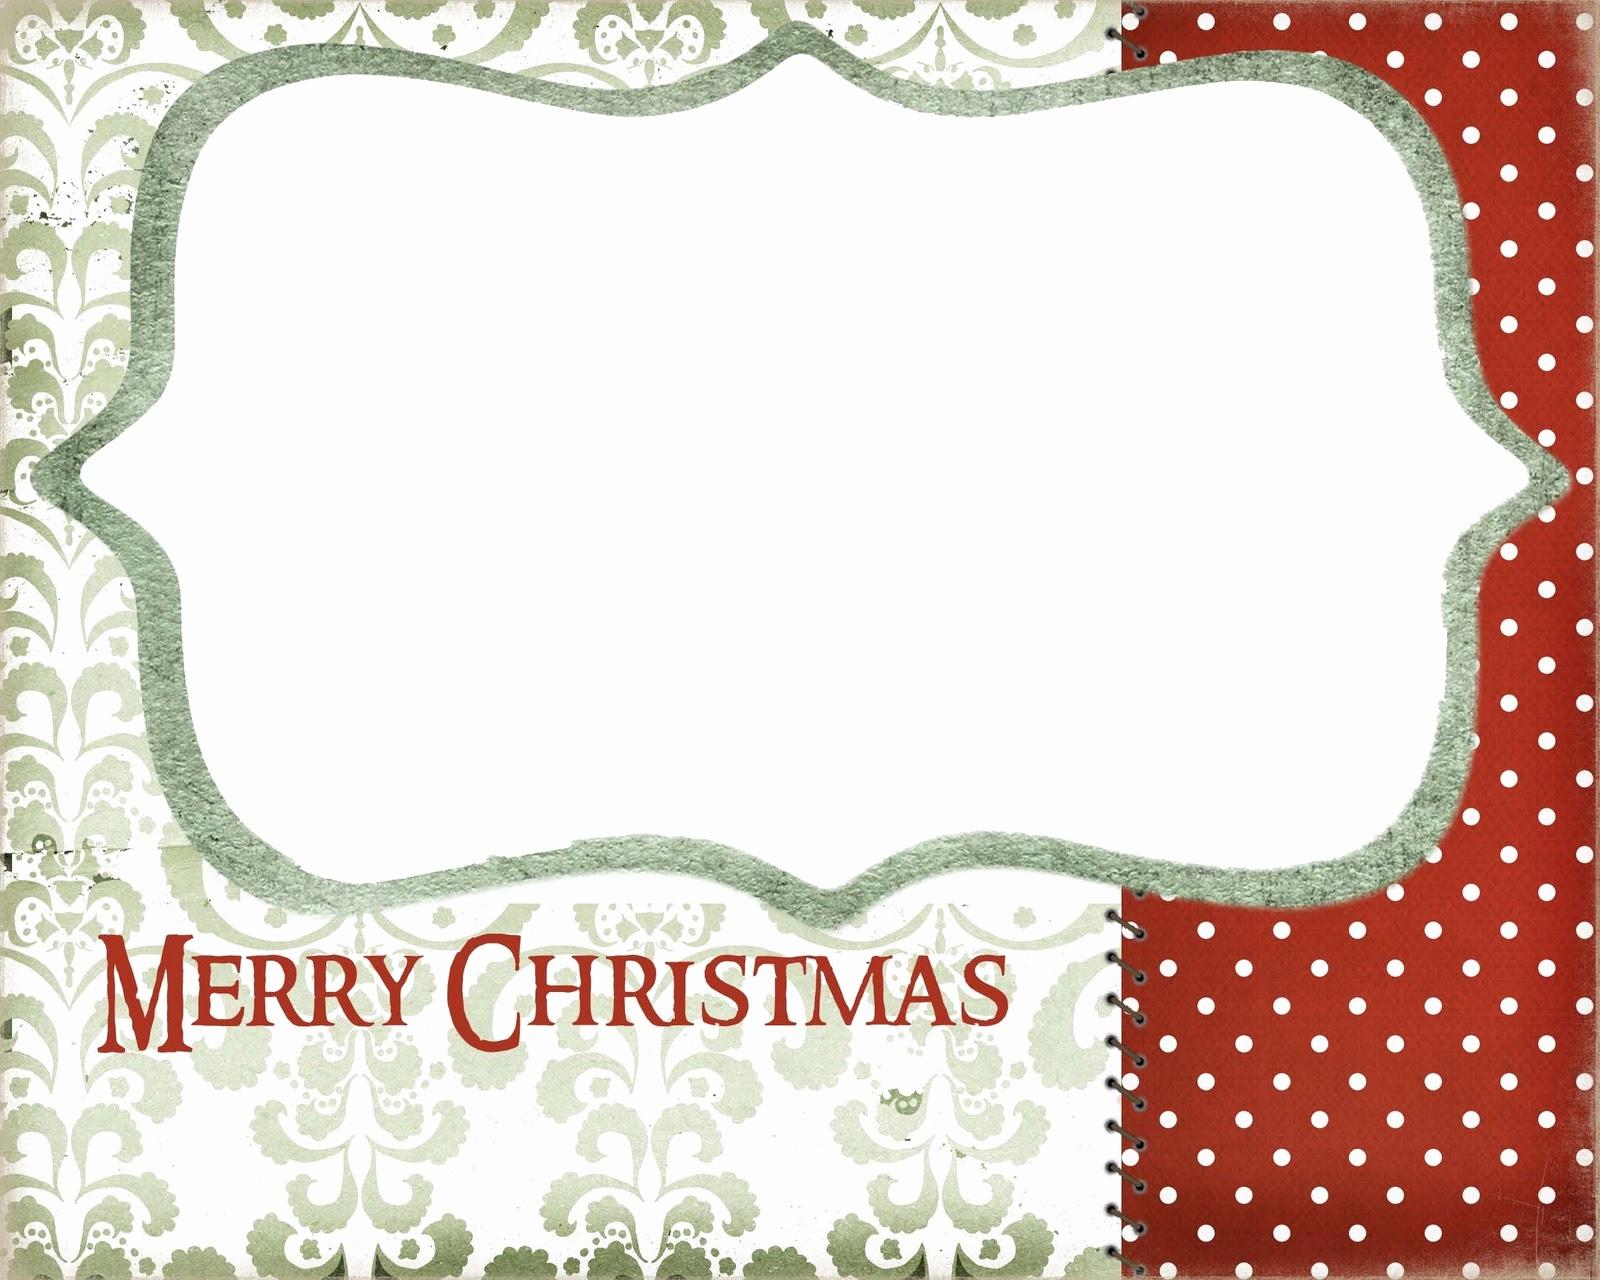 Free Printable Christmas Card Templates For Photos Awesome Christmas - Free Printable Christmas Card Templates